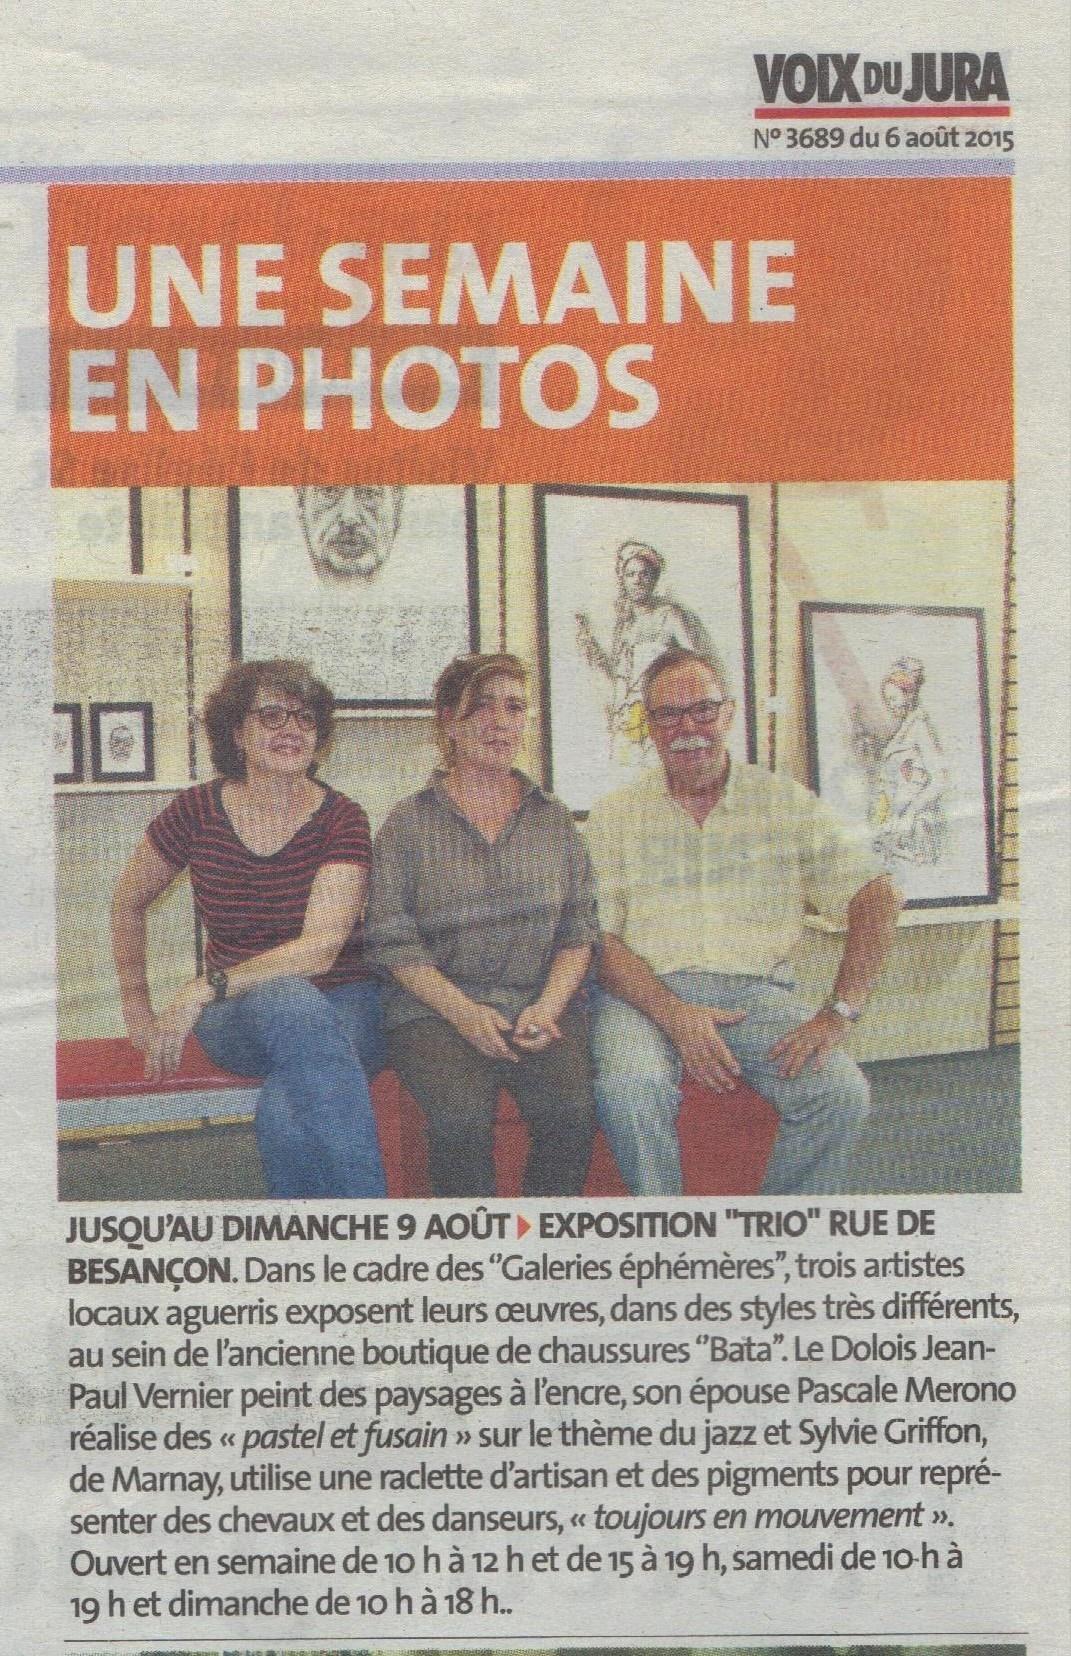 Expo TRIO Voix du Jura 06 08 2015 001